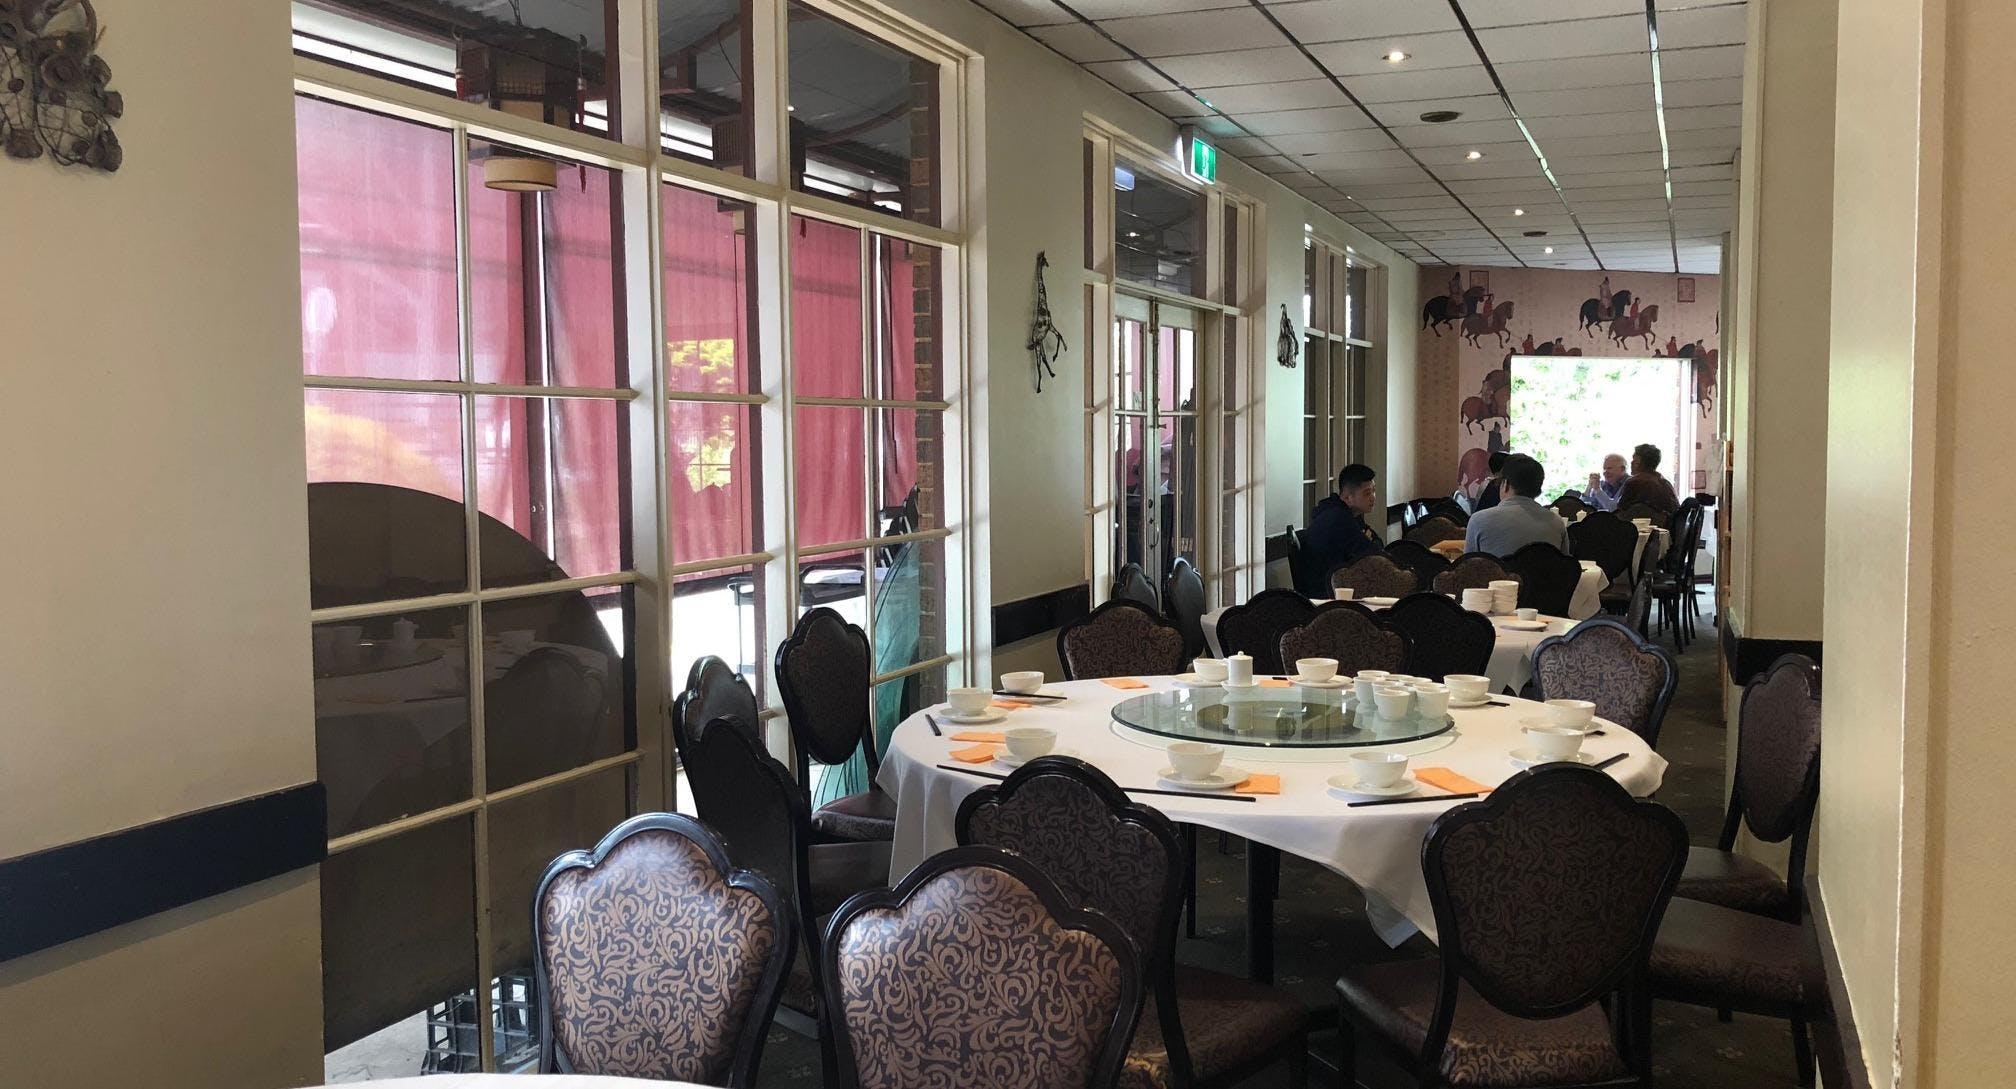 New Royal Garden Restaurant Melbourne image 3